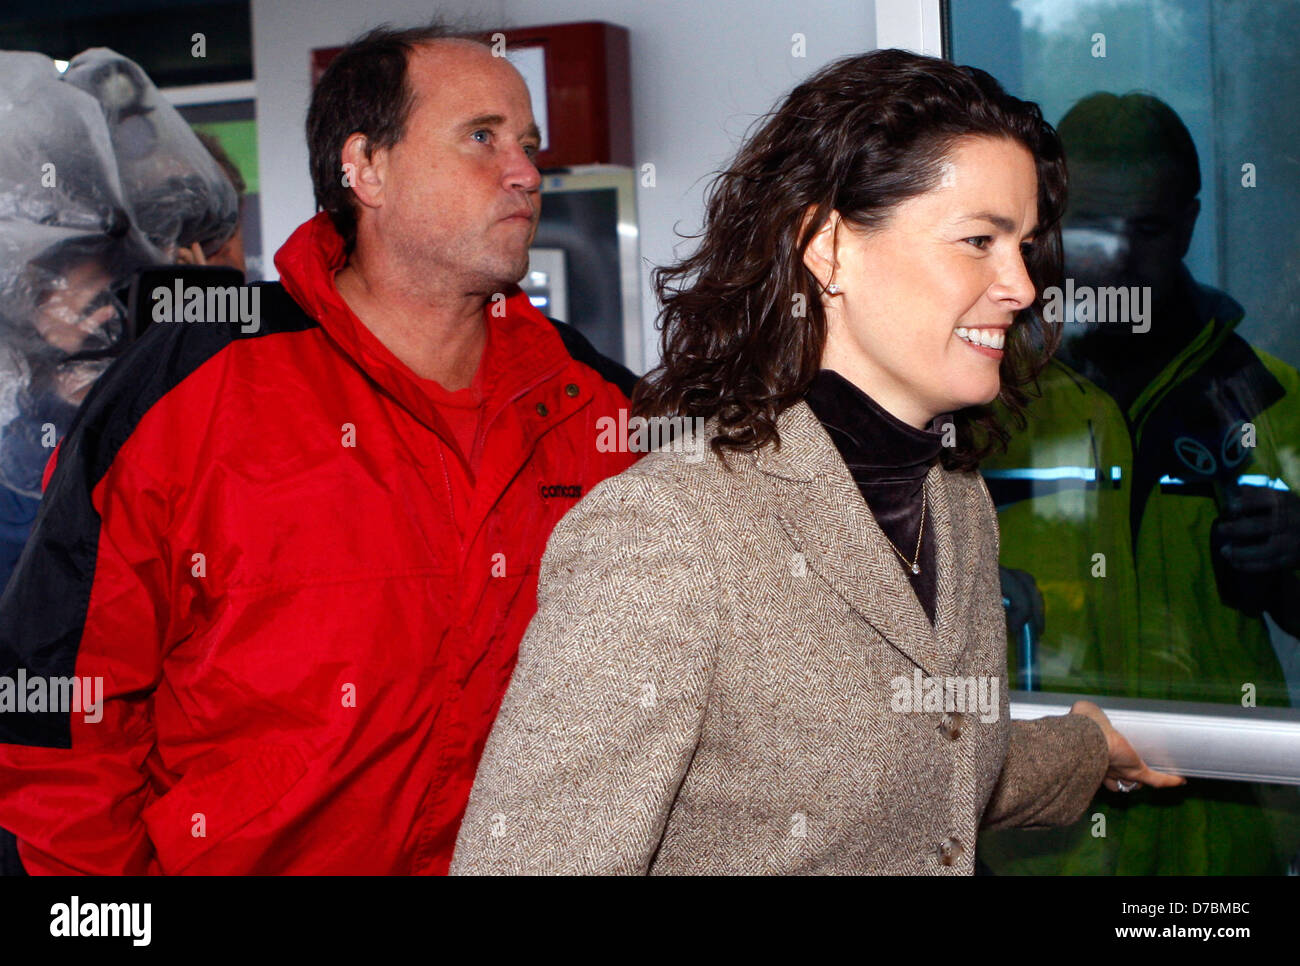 Nancy Kerrigan (L) former Olympic figure skater Nancy Kerrigan arrives at Middlesex Superior Court Woburn, Massachusetts - Stock Image